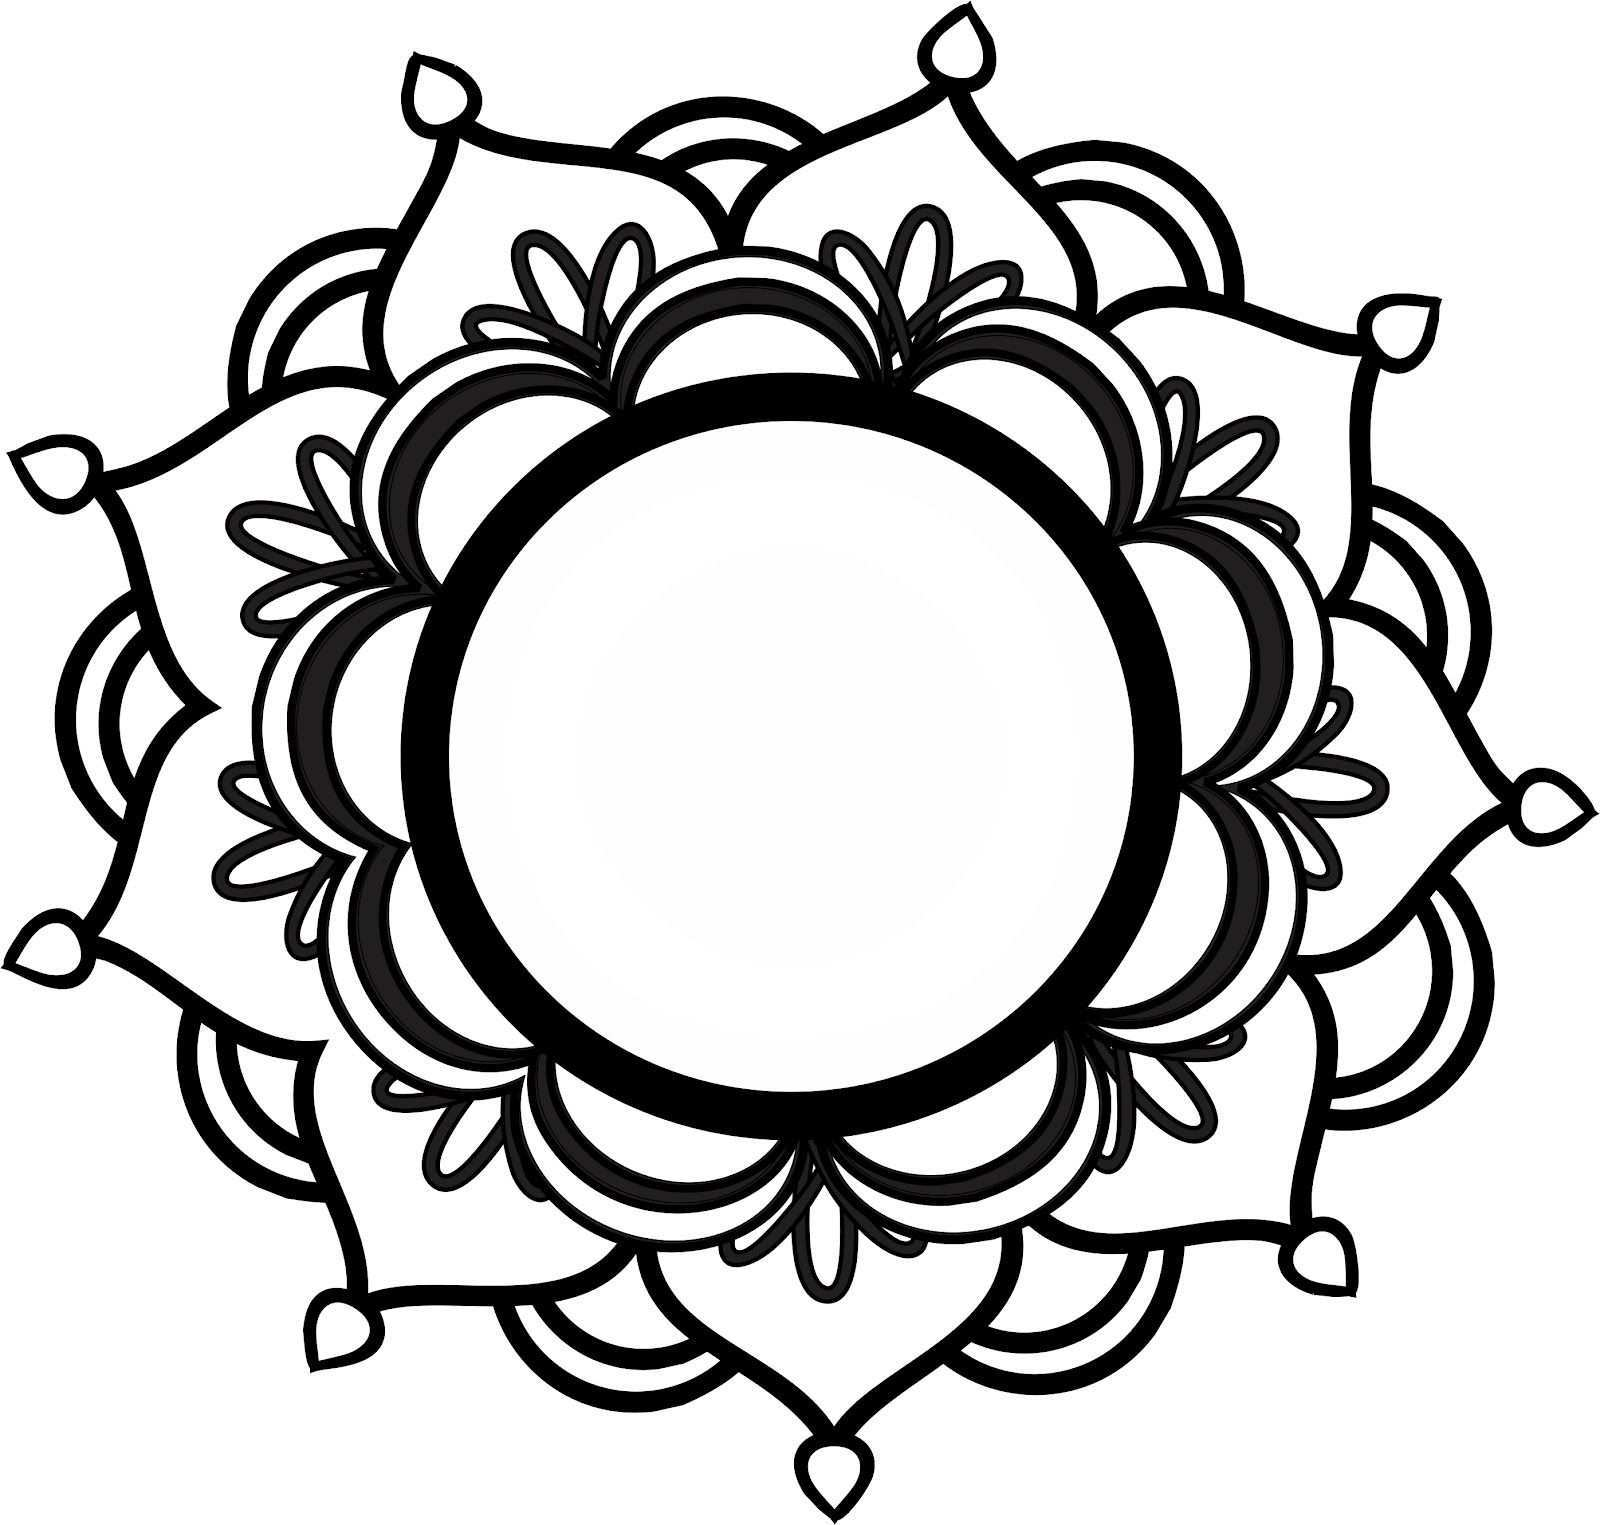 Pin Von Colleen Tensing Auf Drawing Mandala Blumen Mandala Zum Ausdrucken Und Mandala Design